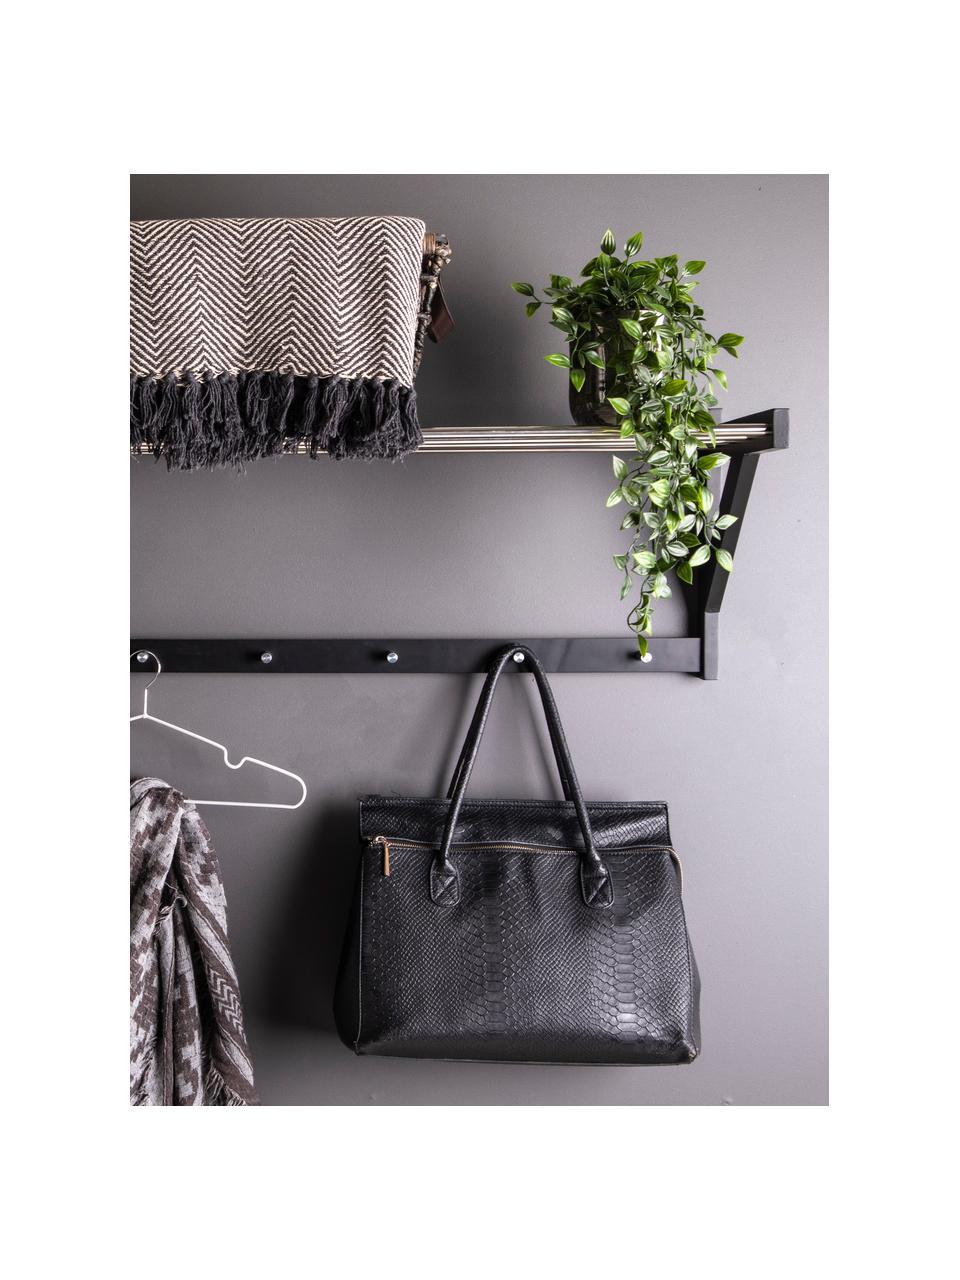 Wandkapstok Padova van metaal en hout, Frame: populierenhout, Stang: staal, Zwart, staalkleurig, 78 x 34 cm